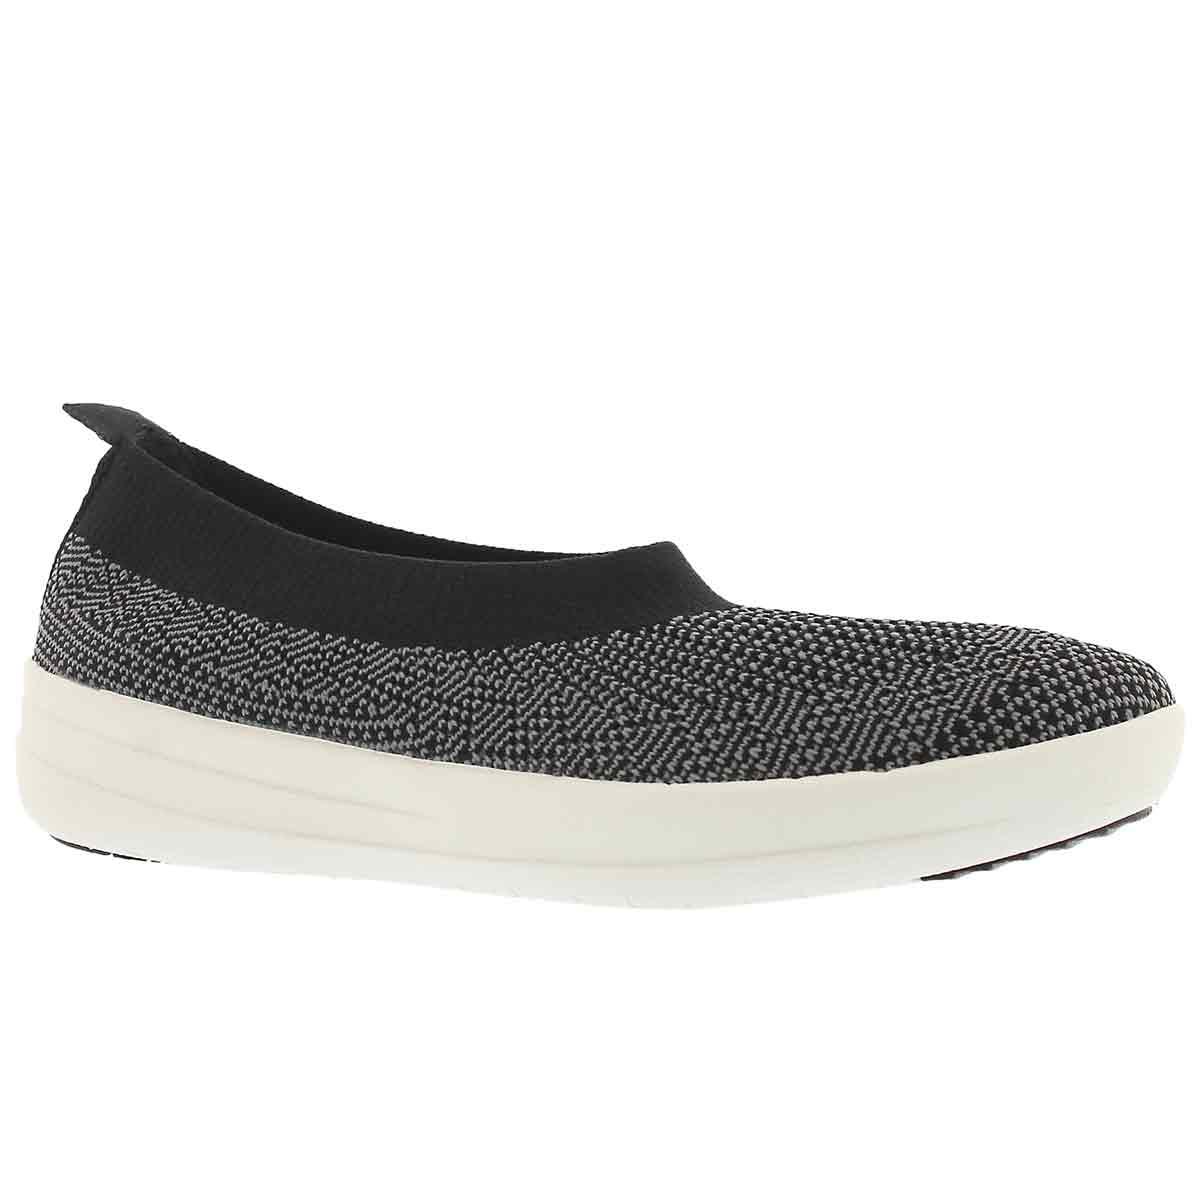 Women's UBERKNIT BALLERINA black walking shoes